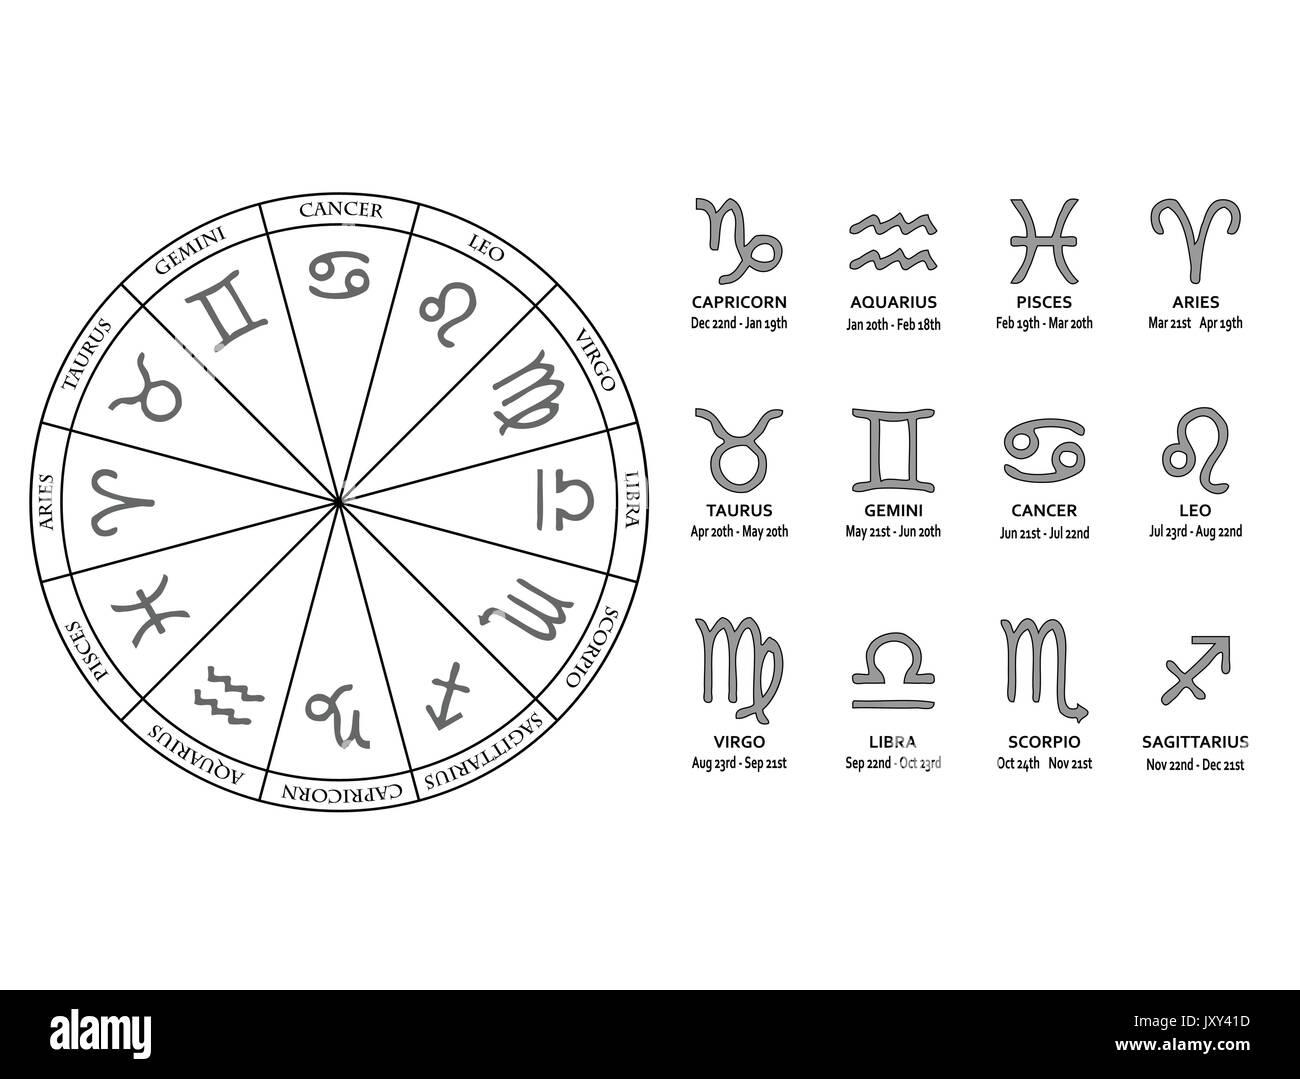 Zodiac symbols dates in Brisbane